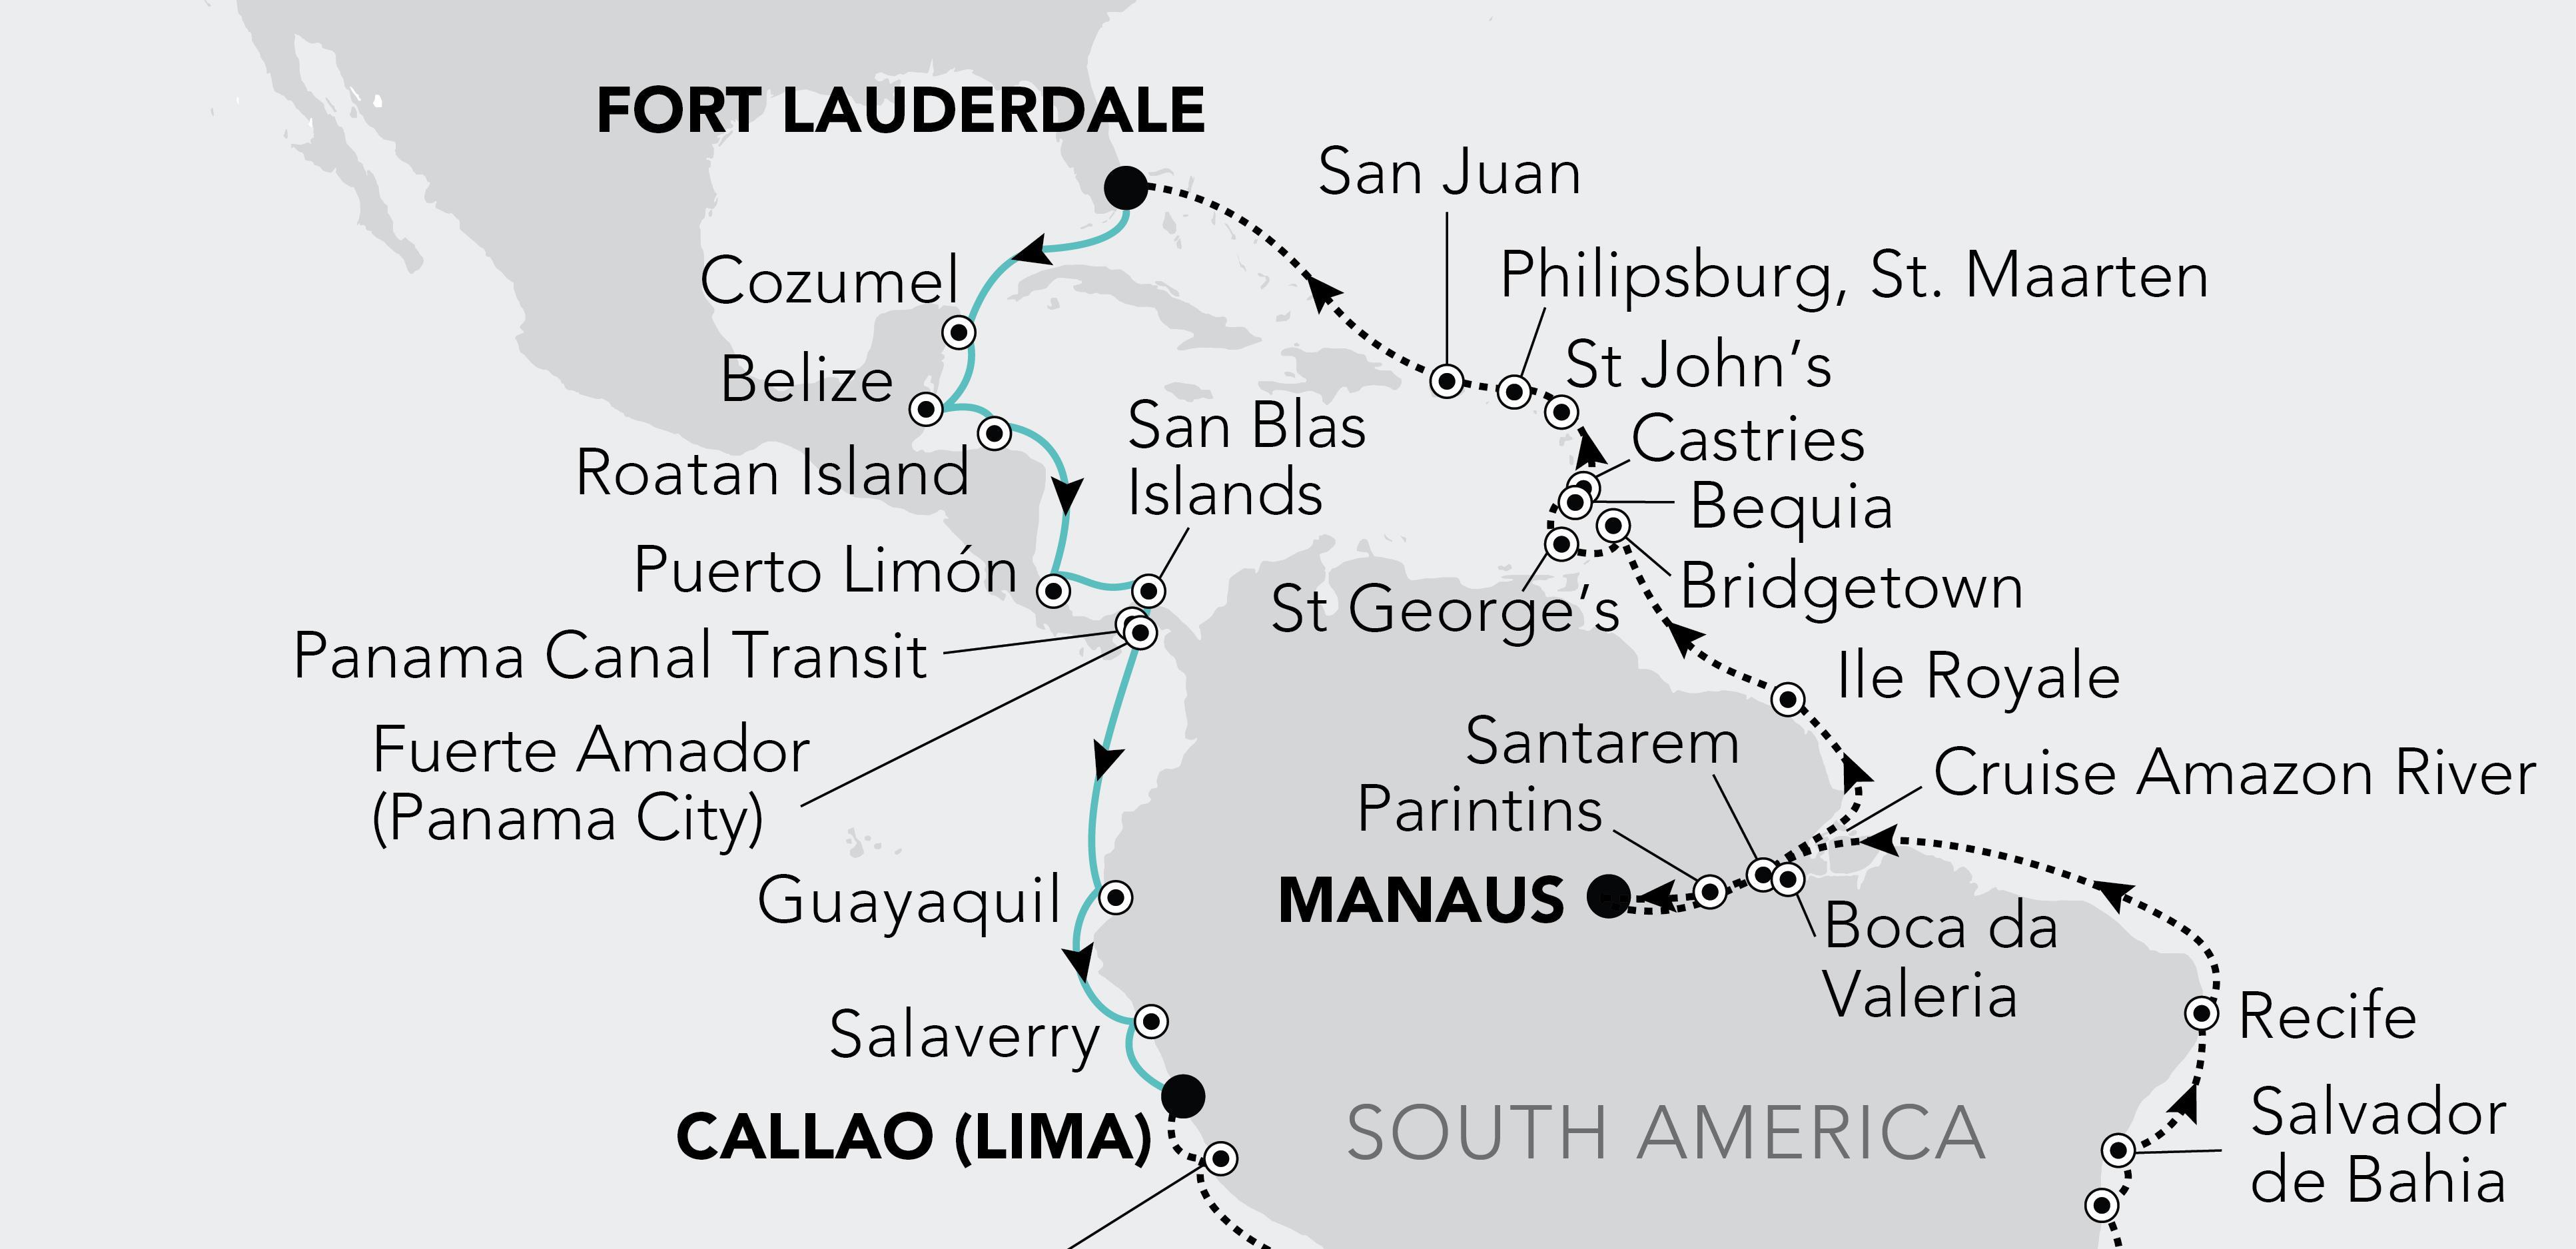 Fort Lauderdale, Florida a Lima (Callao)